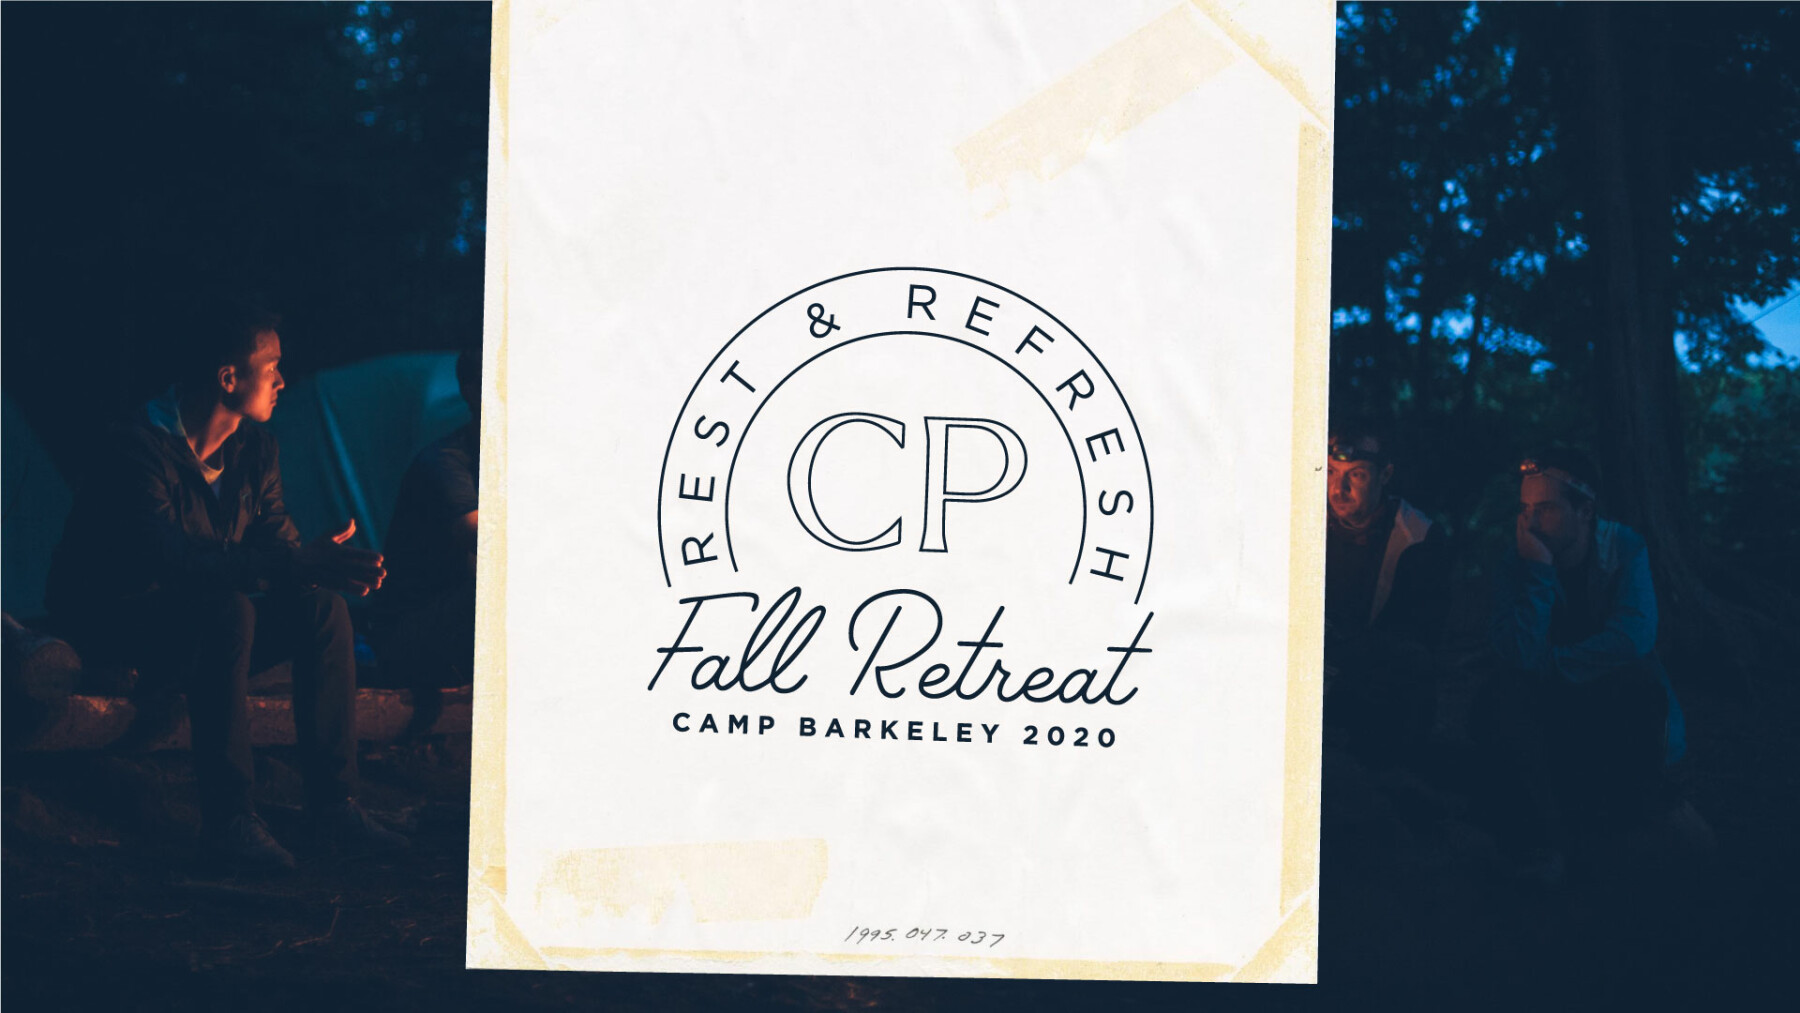 College Park Fall Retreat